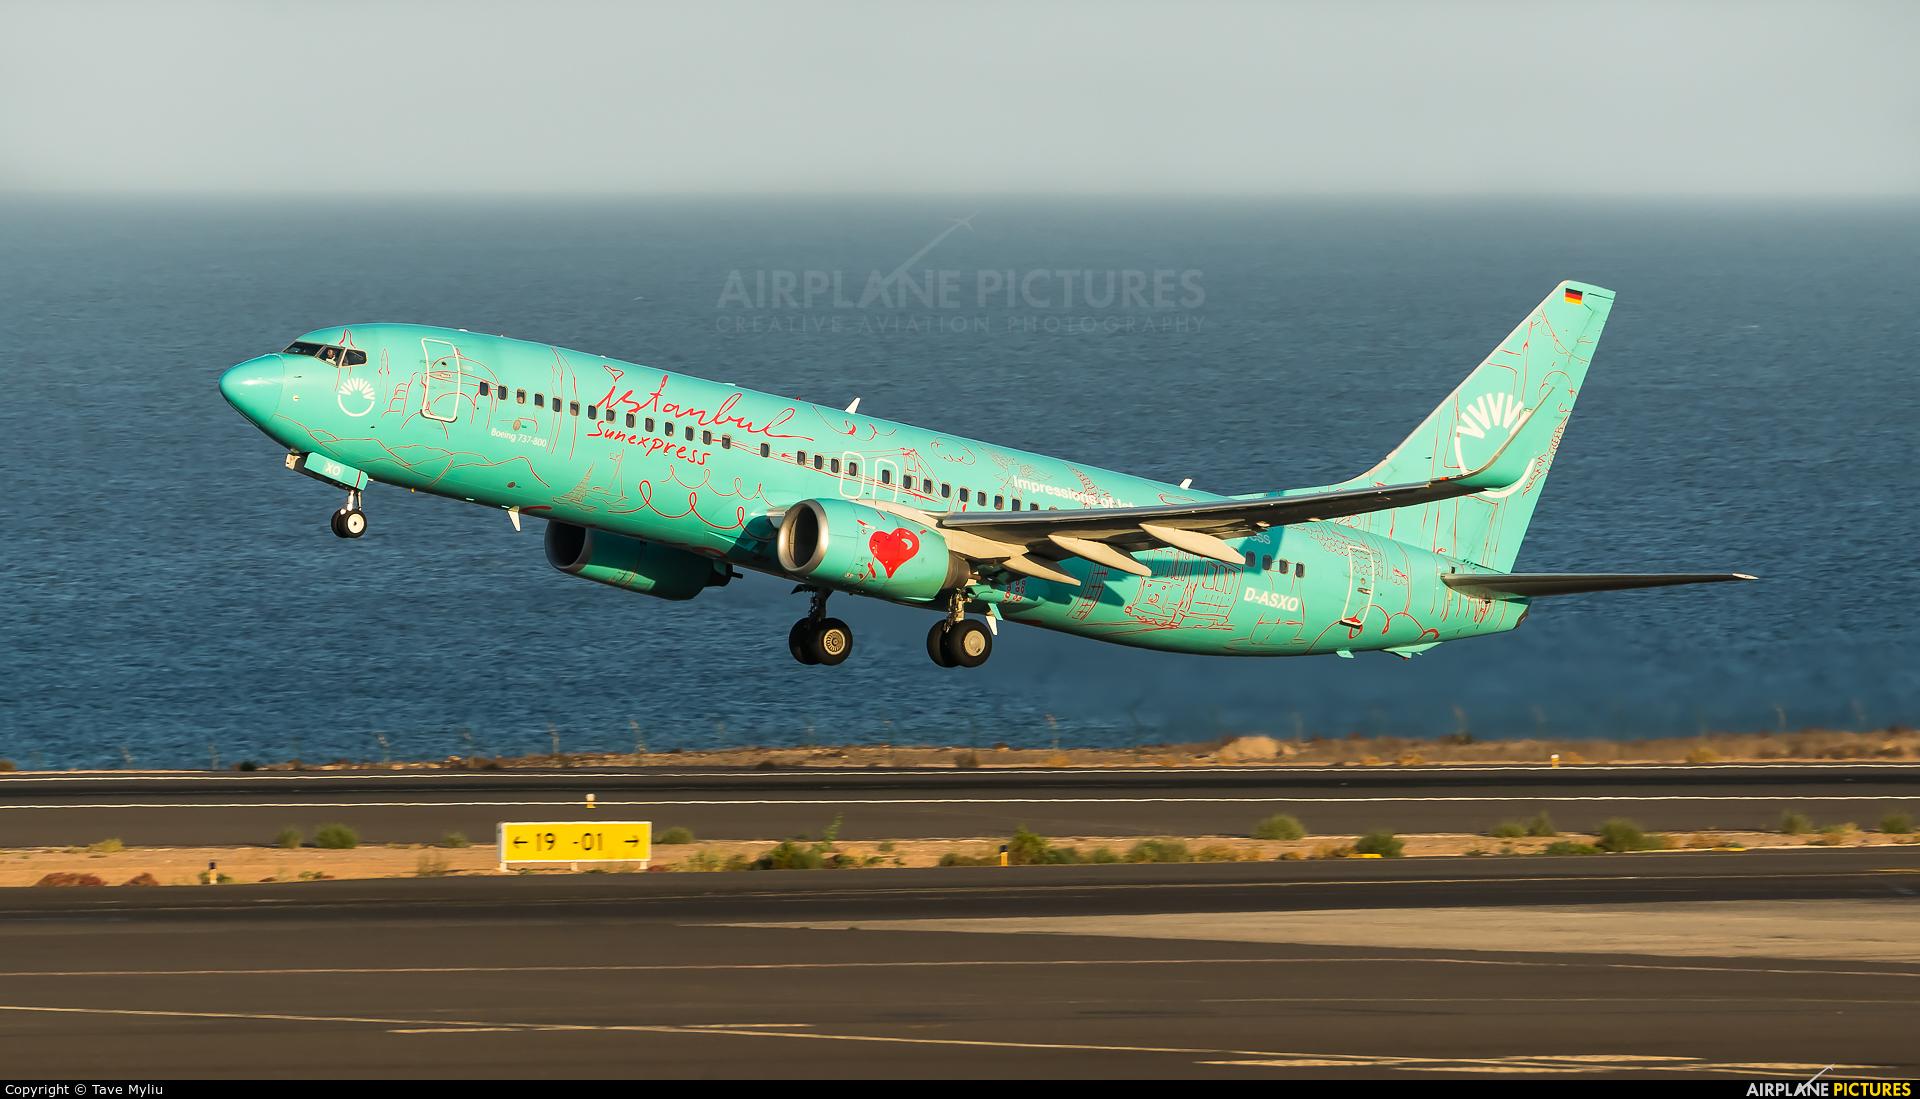 SunExpress Germany D-ASXO aircraft at Fuerteventura - Puerto del Rosario